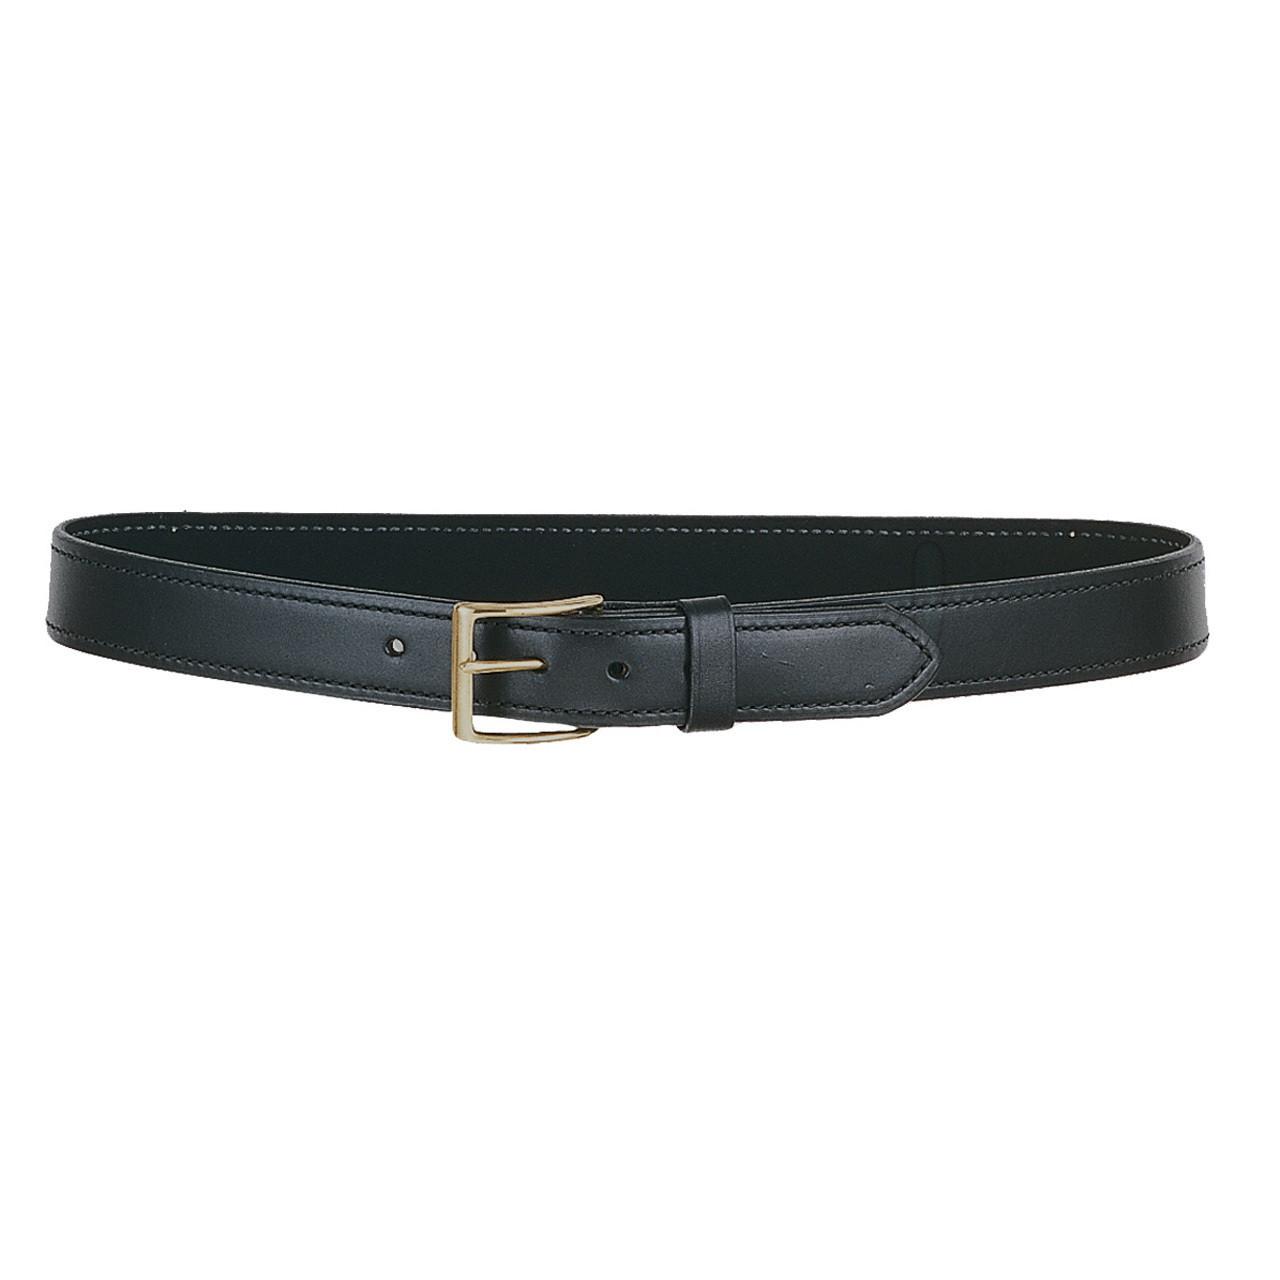 "1 1/4"" Belt"